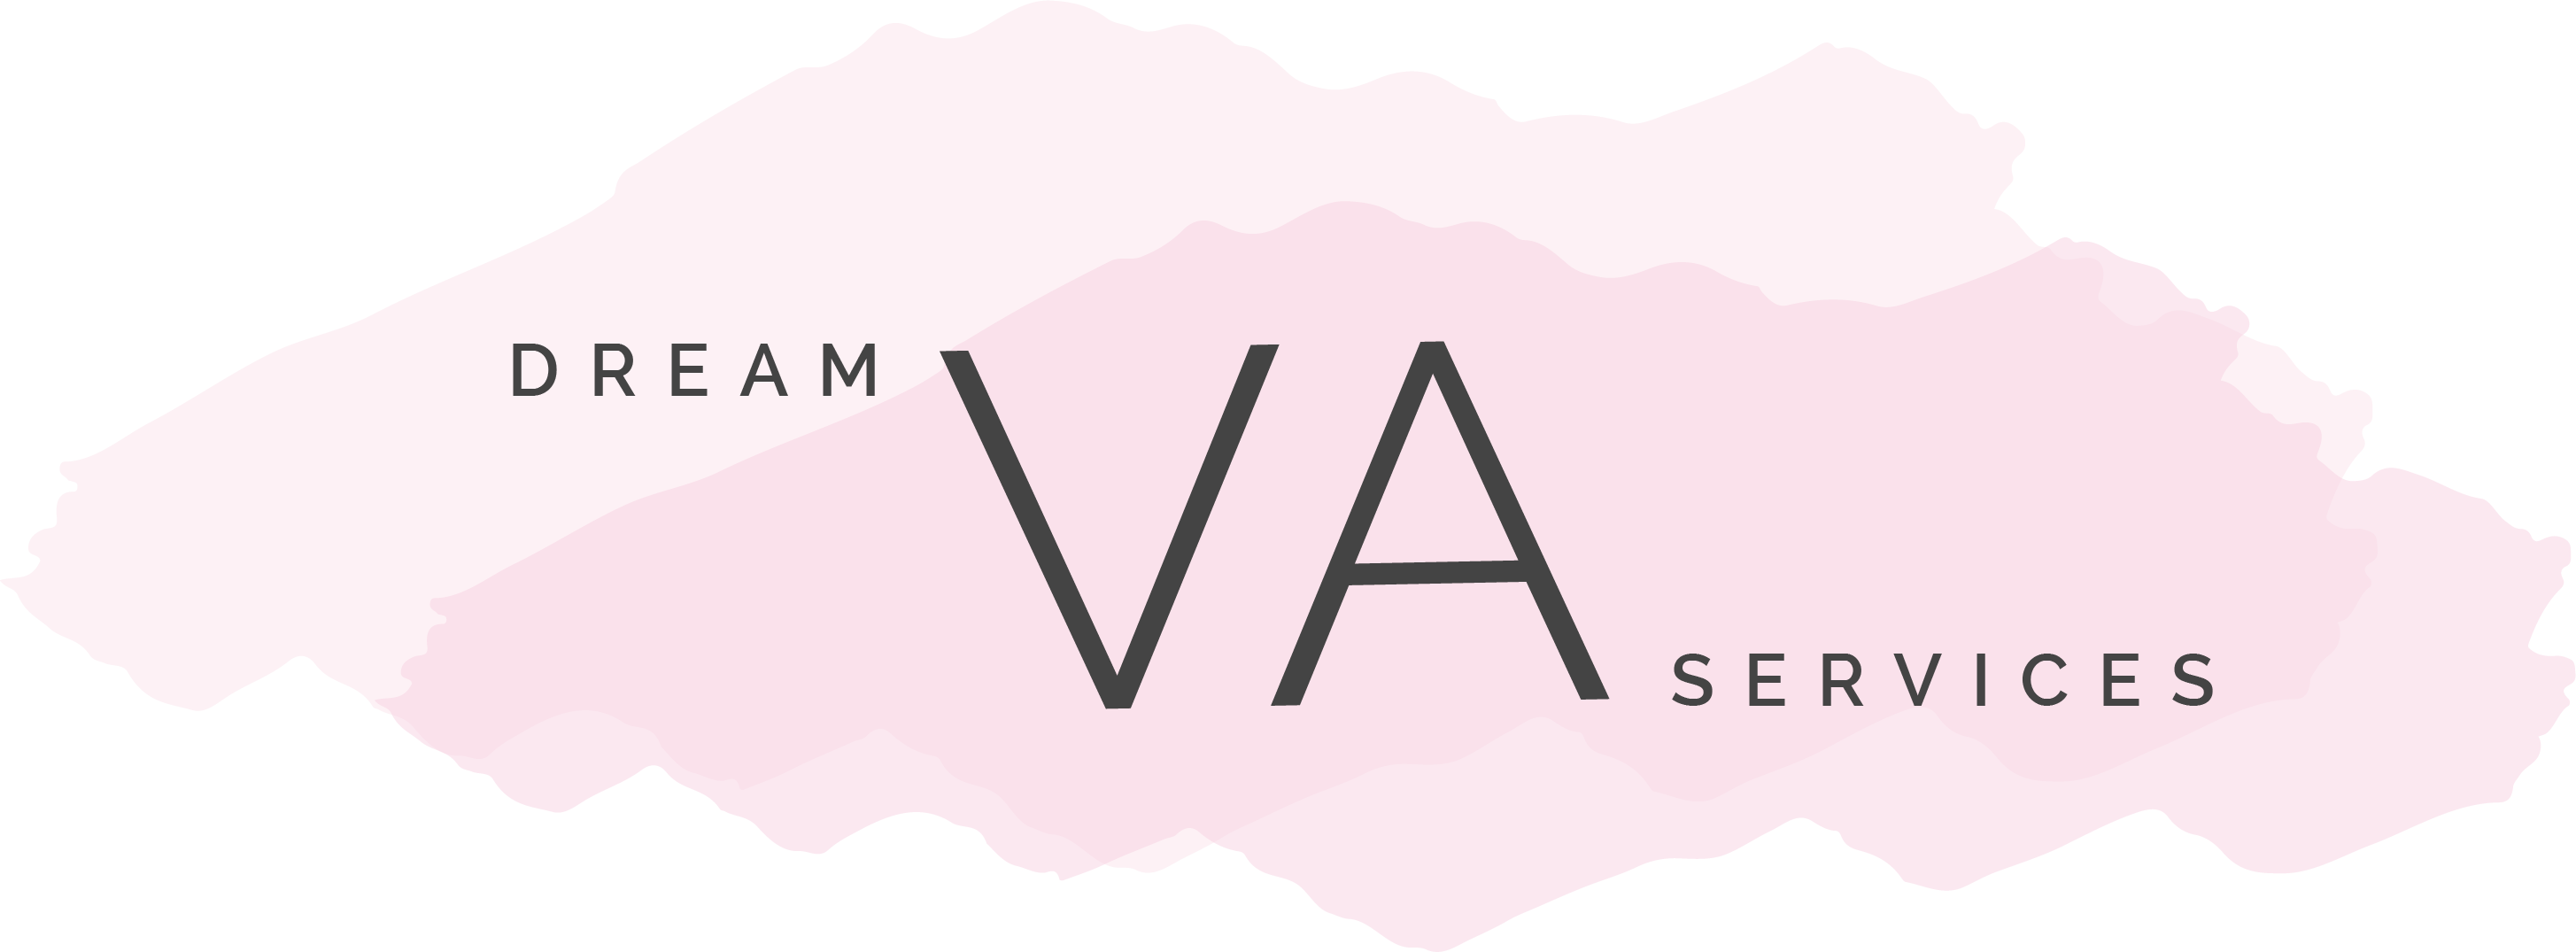 Dream VA Services